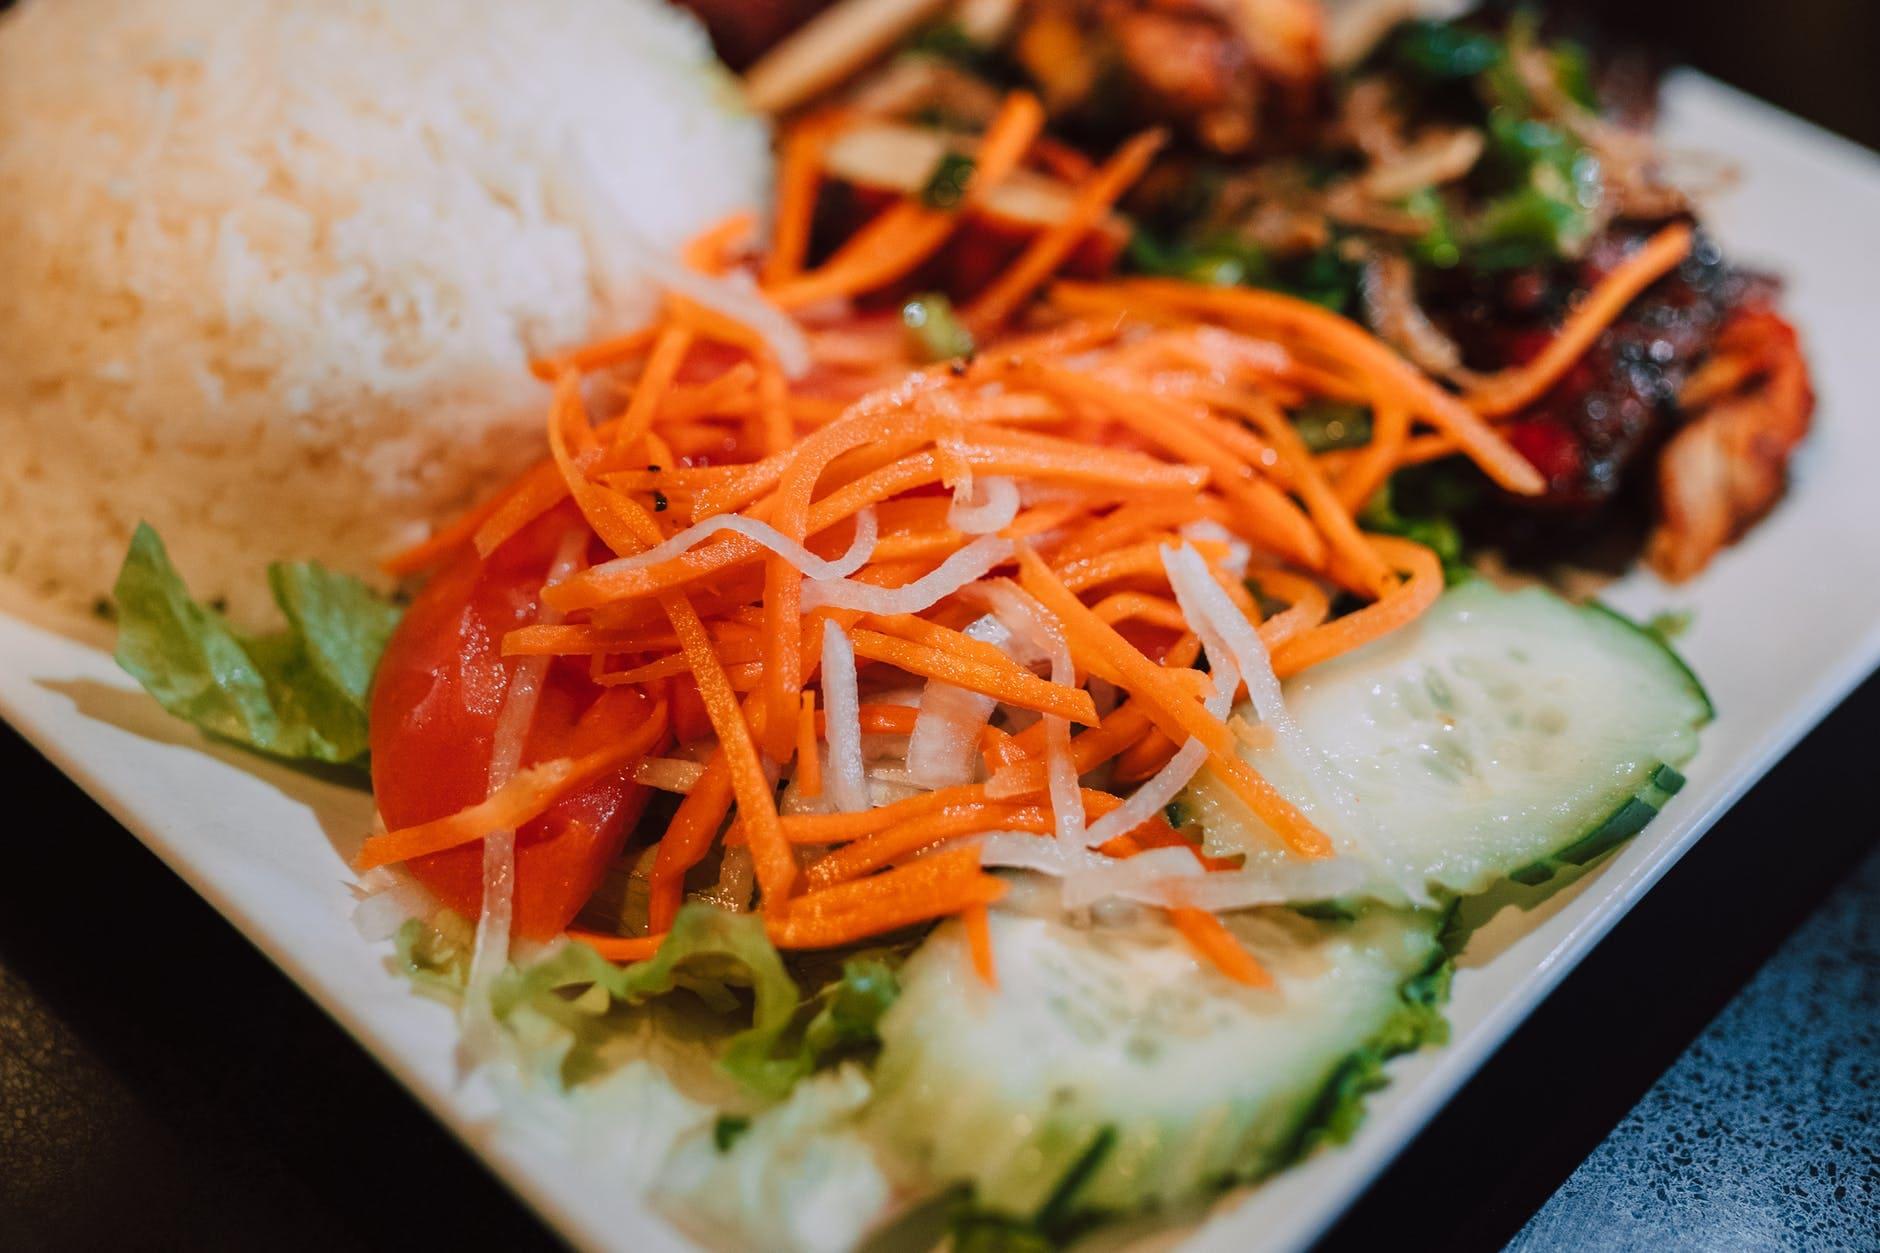 Iranian style carrot salad